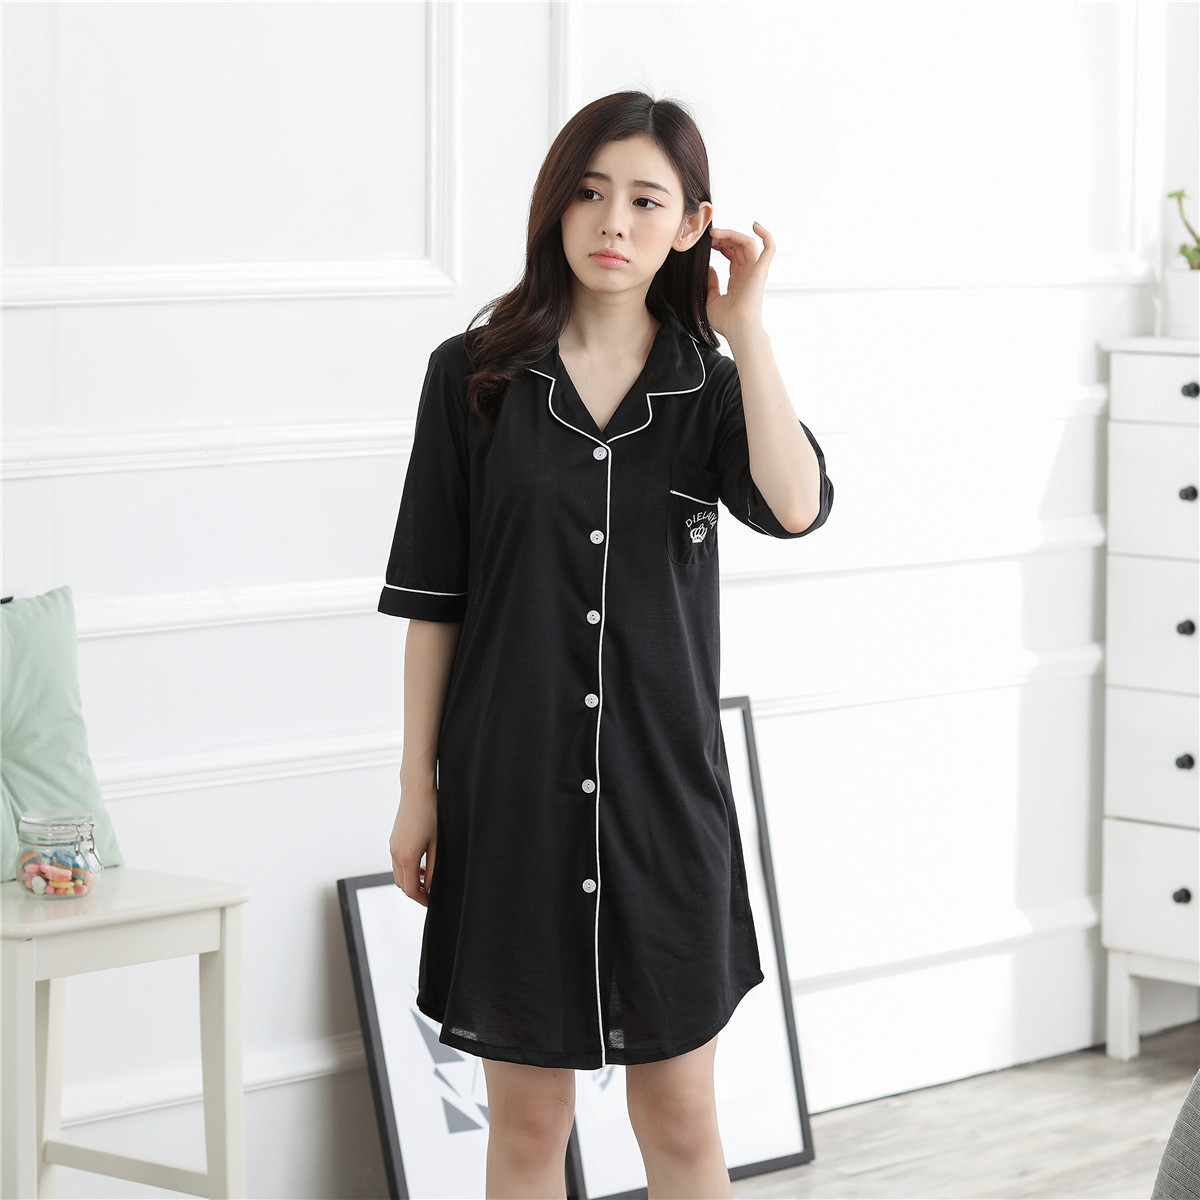 2017 New Style Summer Pajamas Short Sleeve Women's Korean-style Knitted Fabric Victoria's Secret Short Skirt Shirt Home Wear